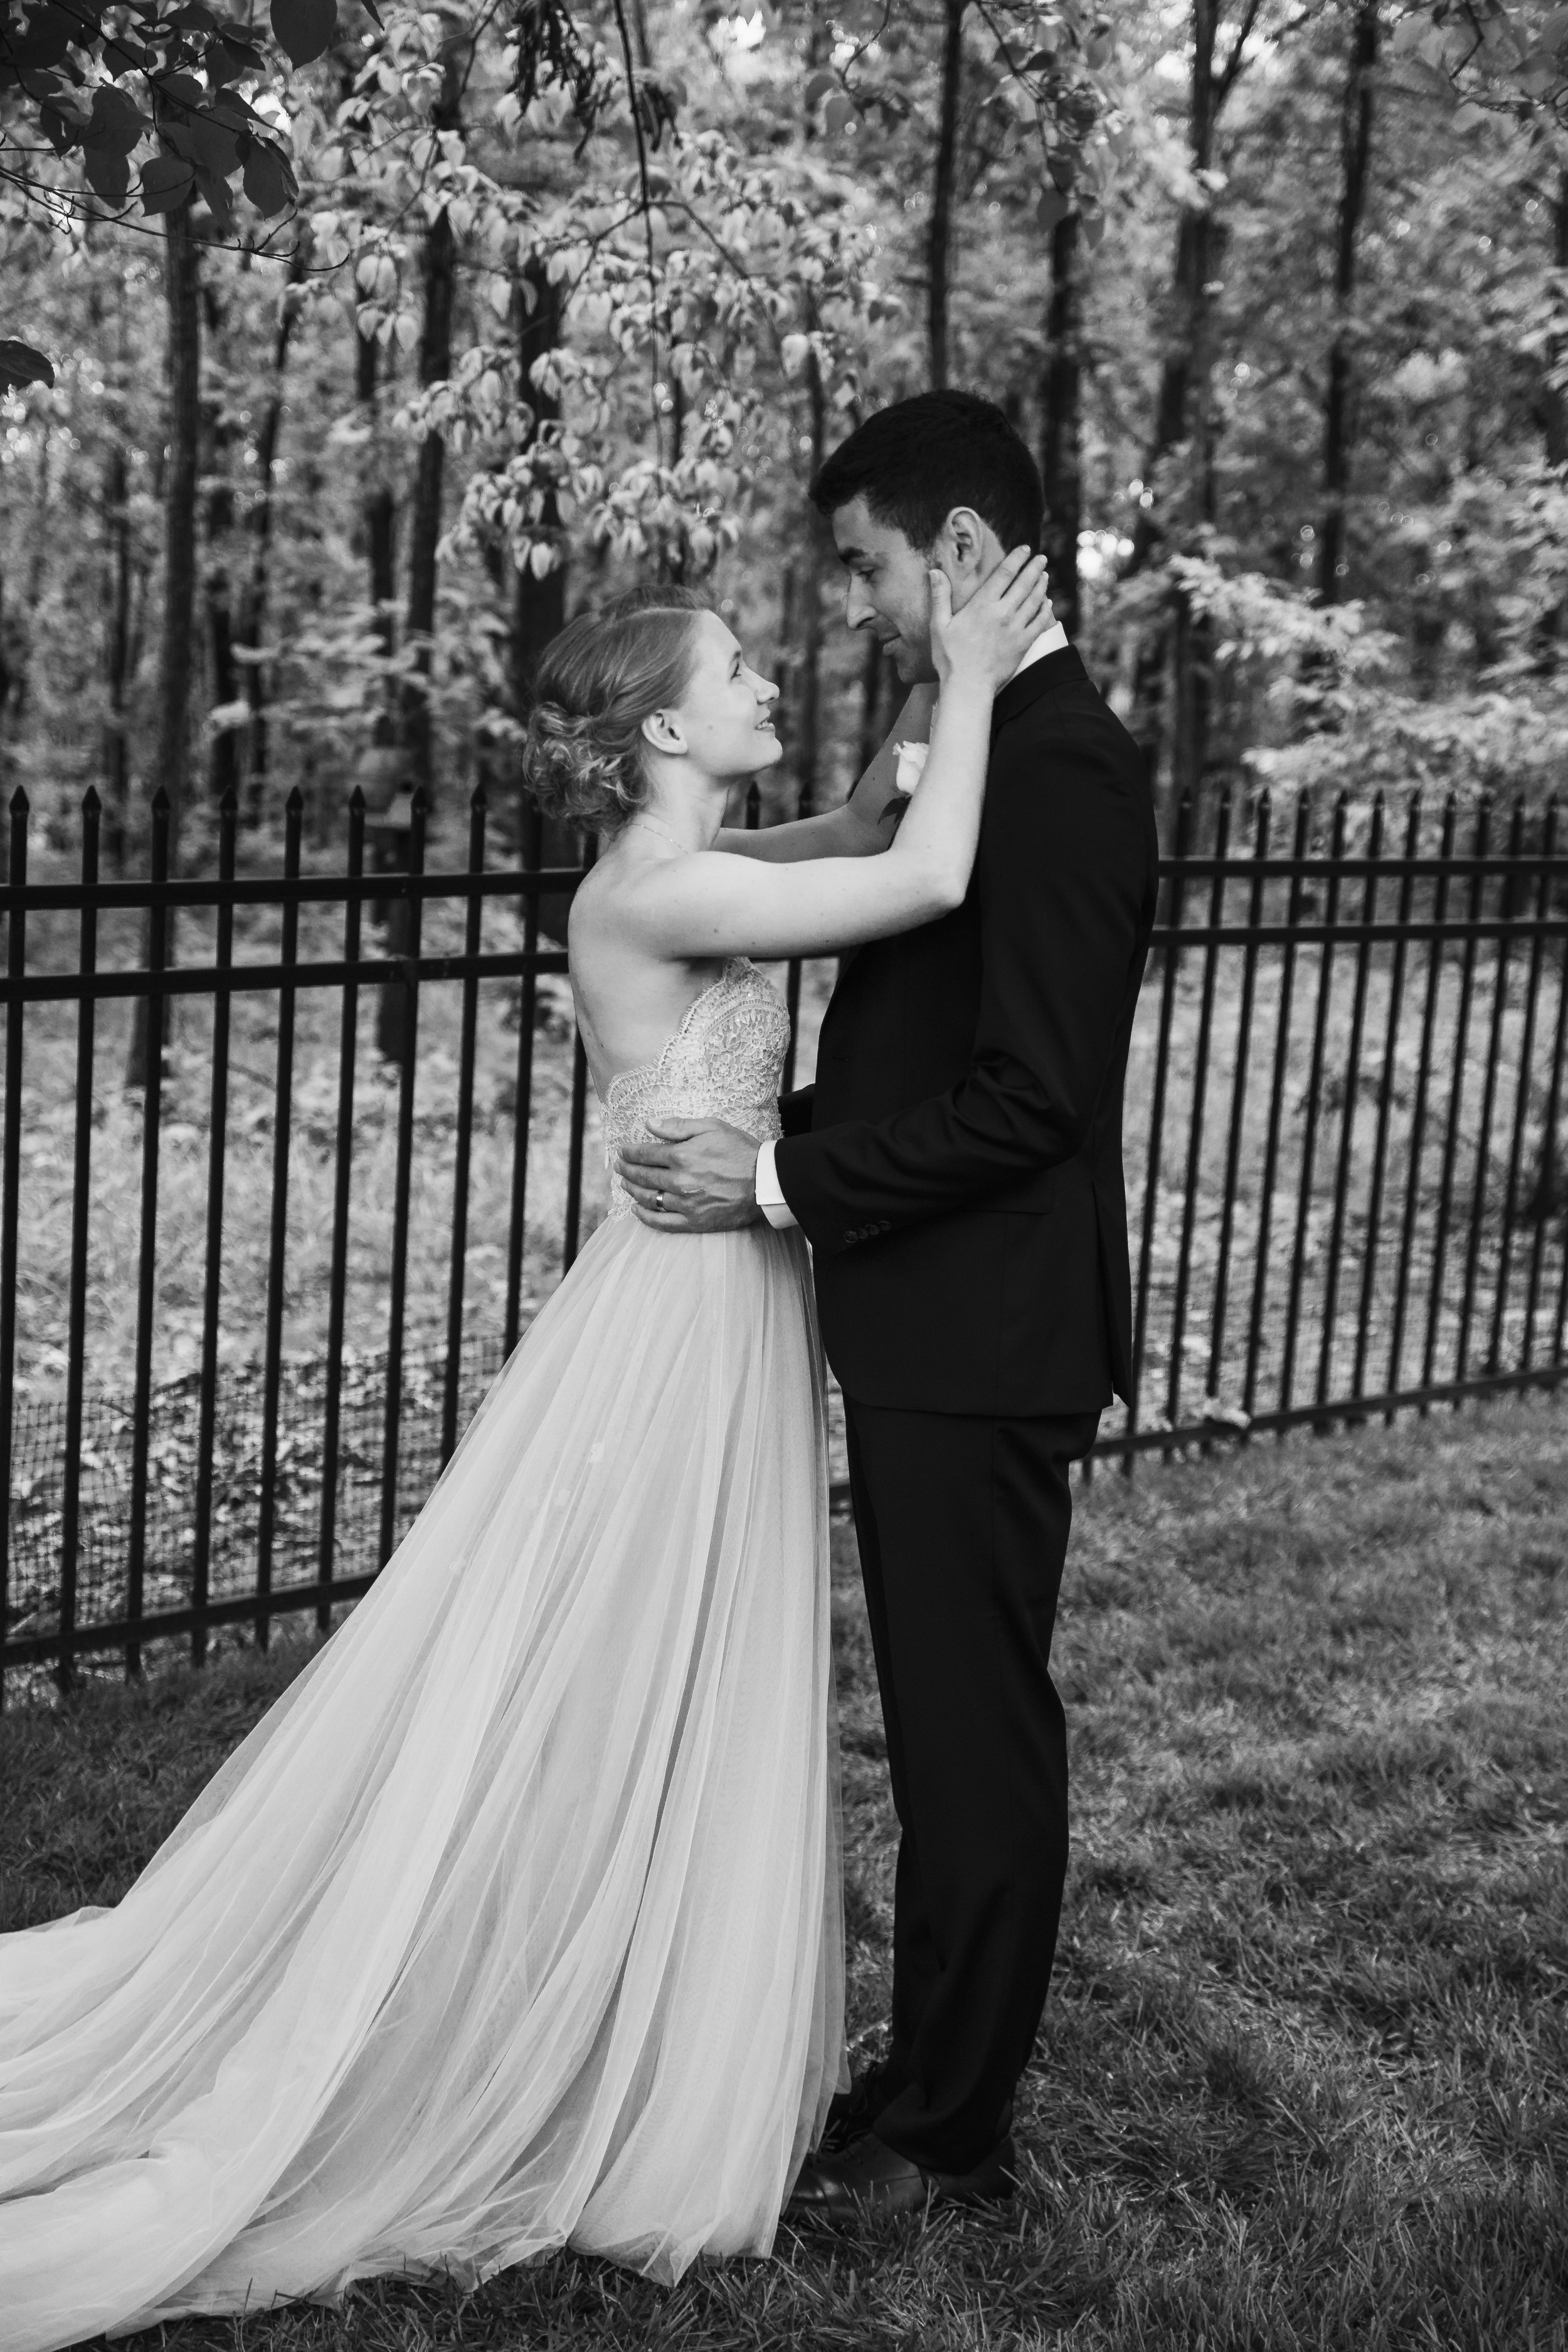 20170520_3564after wedding.jpg